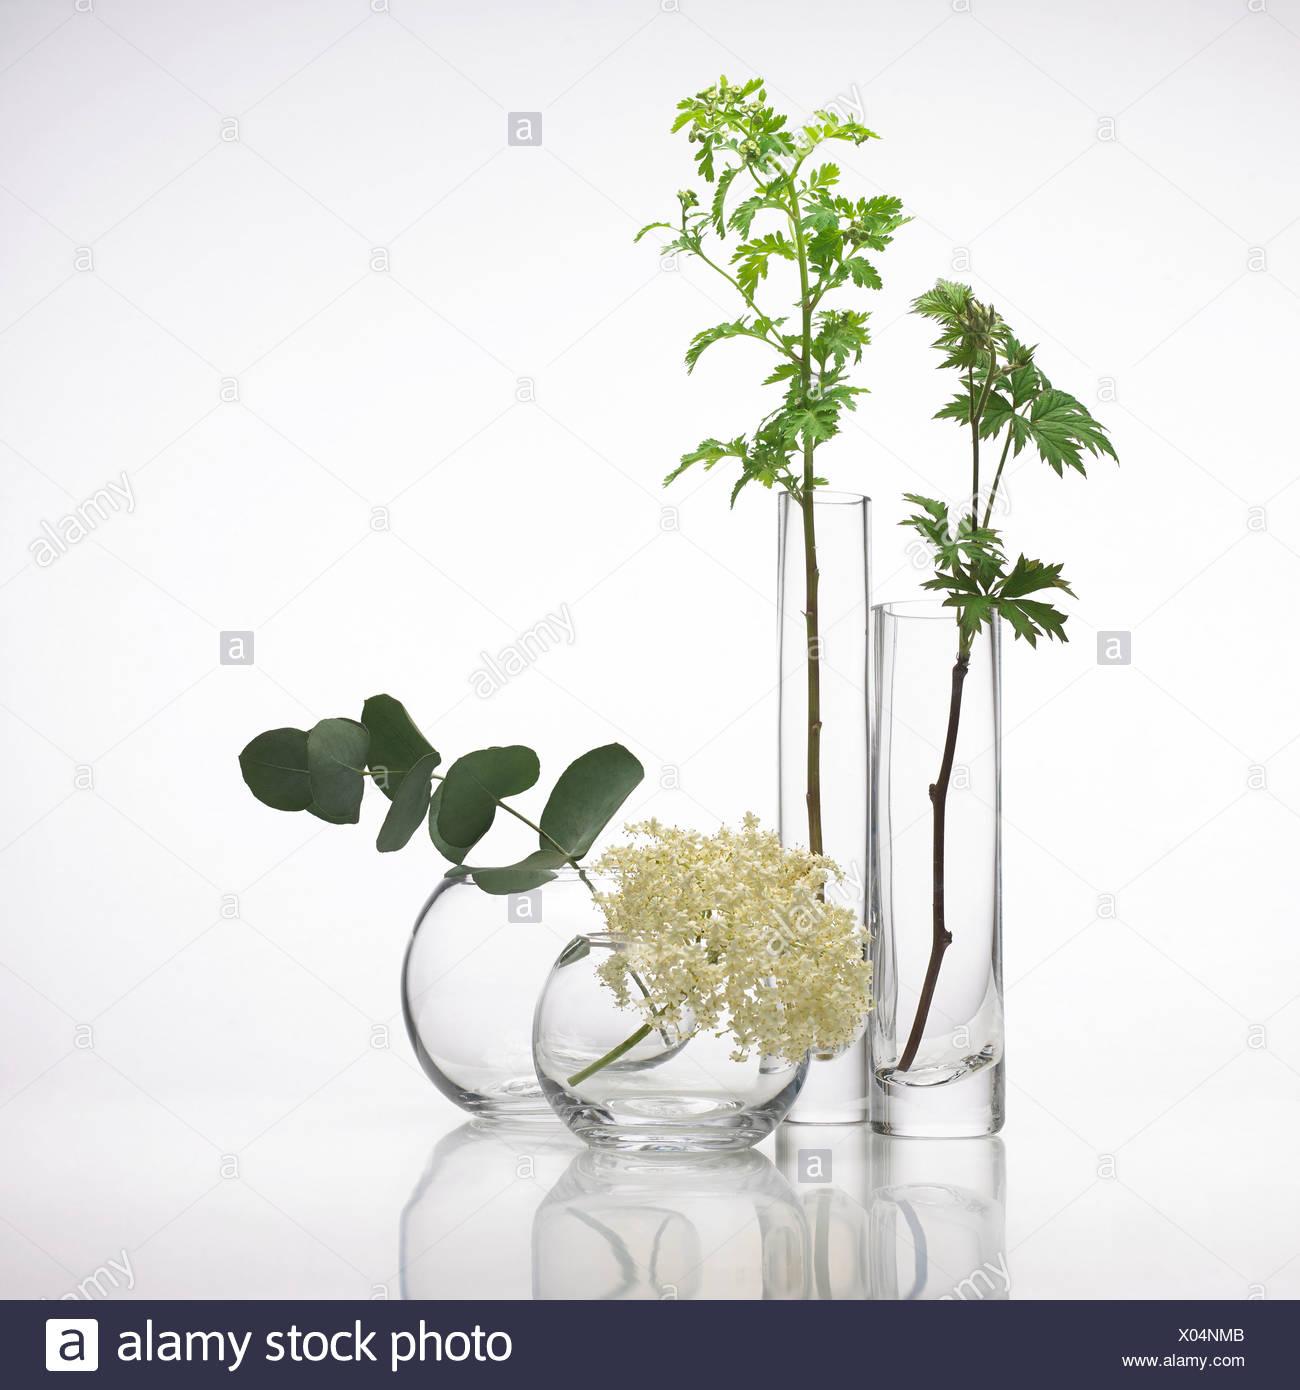 Plantes médicinales, conceptual image Photo Stock